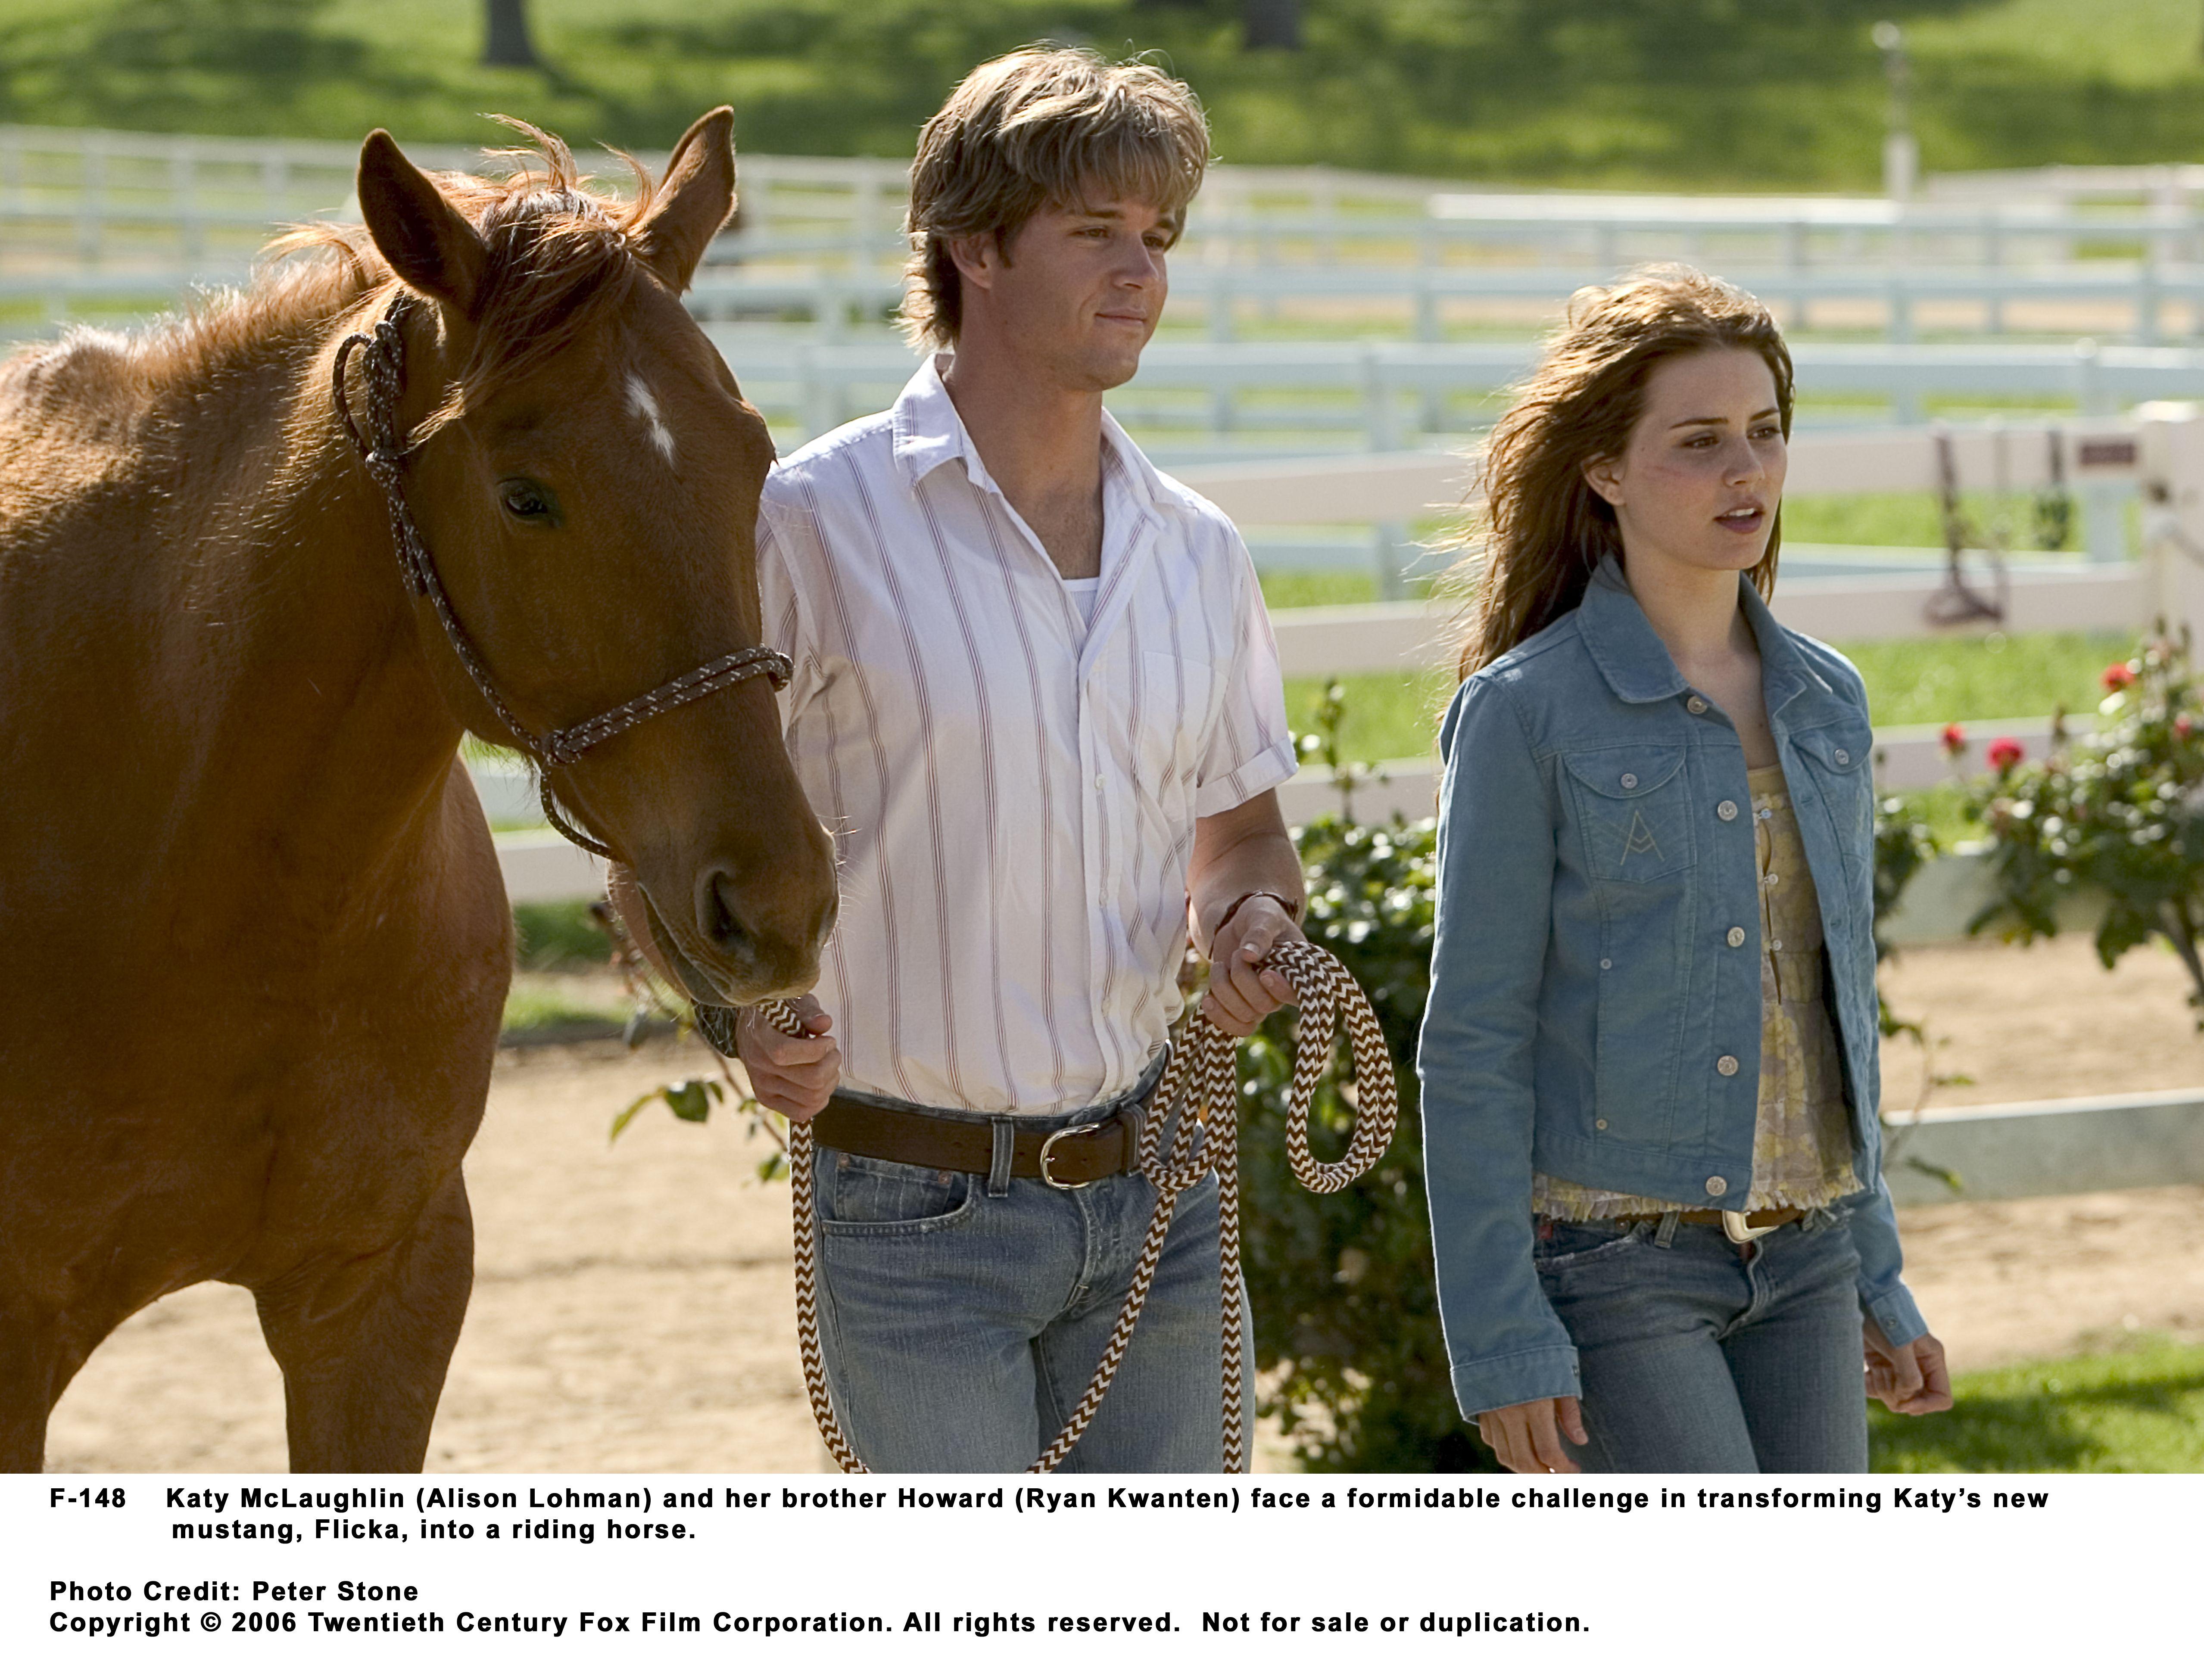 Ryan Kwanten and Alison Lohman in Flicka (2006)